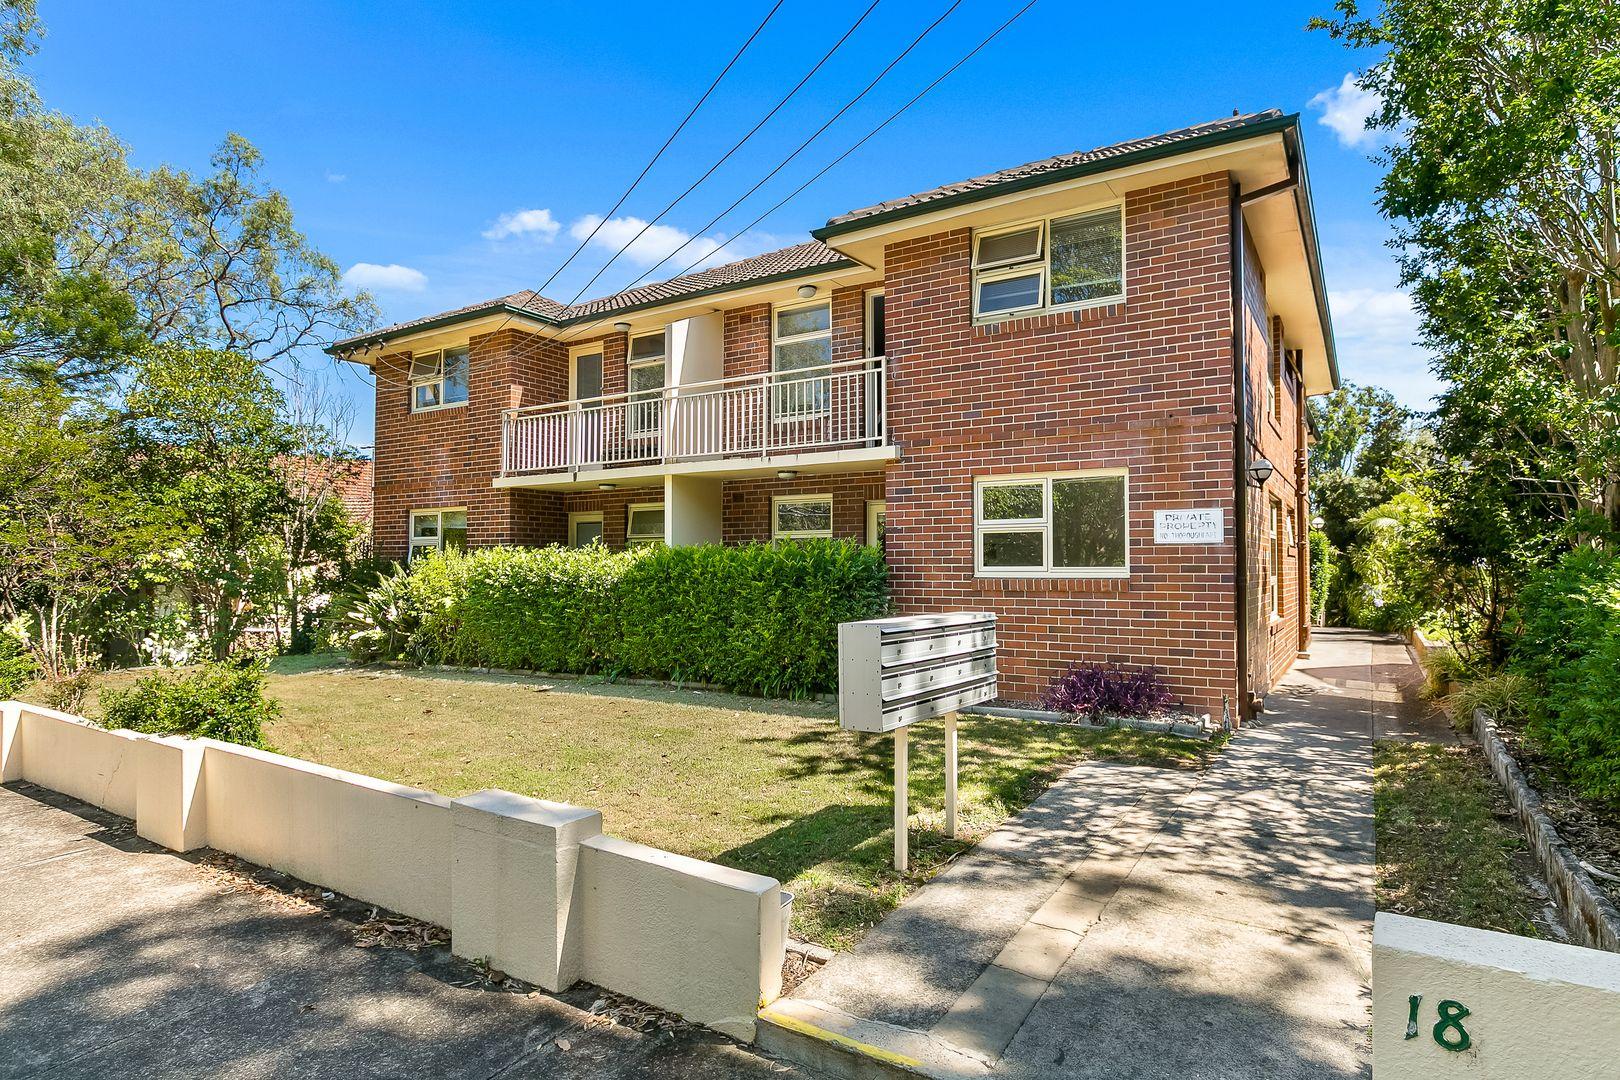 6/18 Cleland Road, Artarmon NSW 2064, Image 0